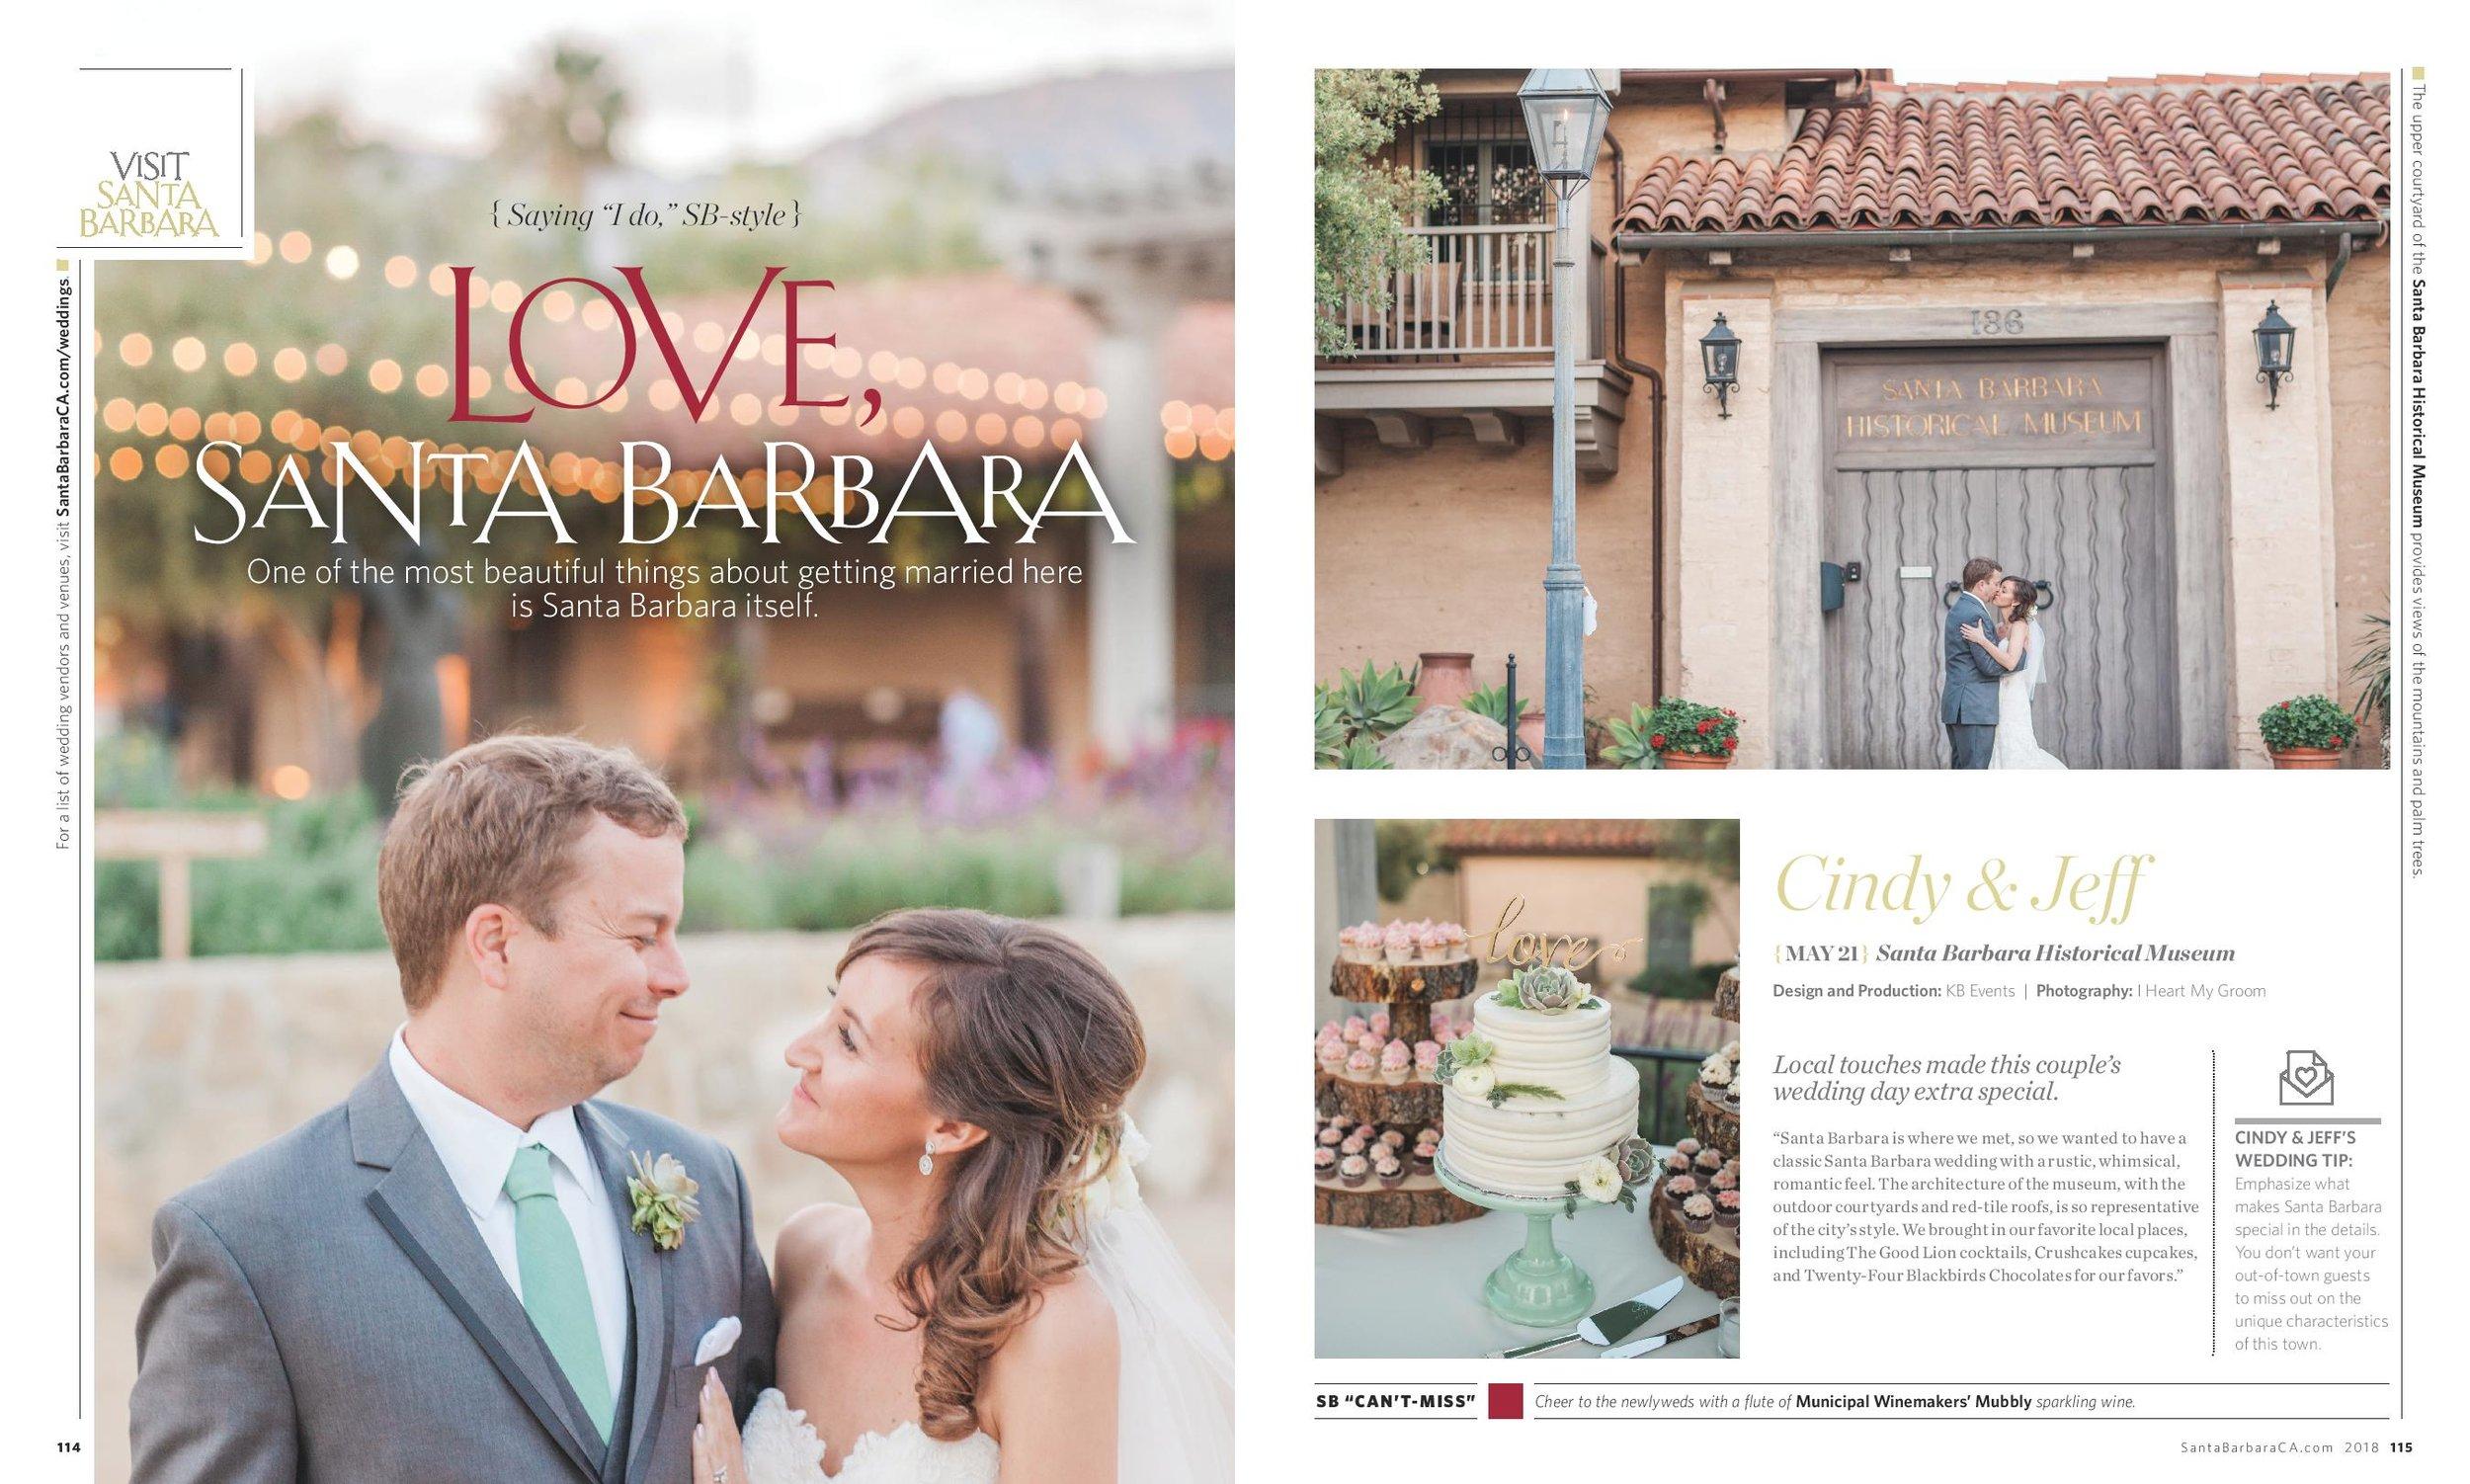 Santa Barbara Wedding - Visit Santa Barbara - Santa Barbara Magazine - KB Events